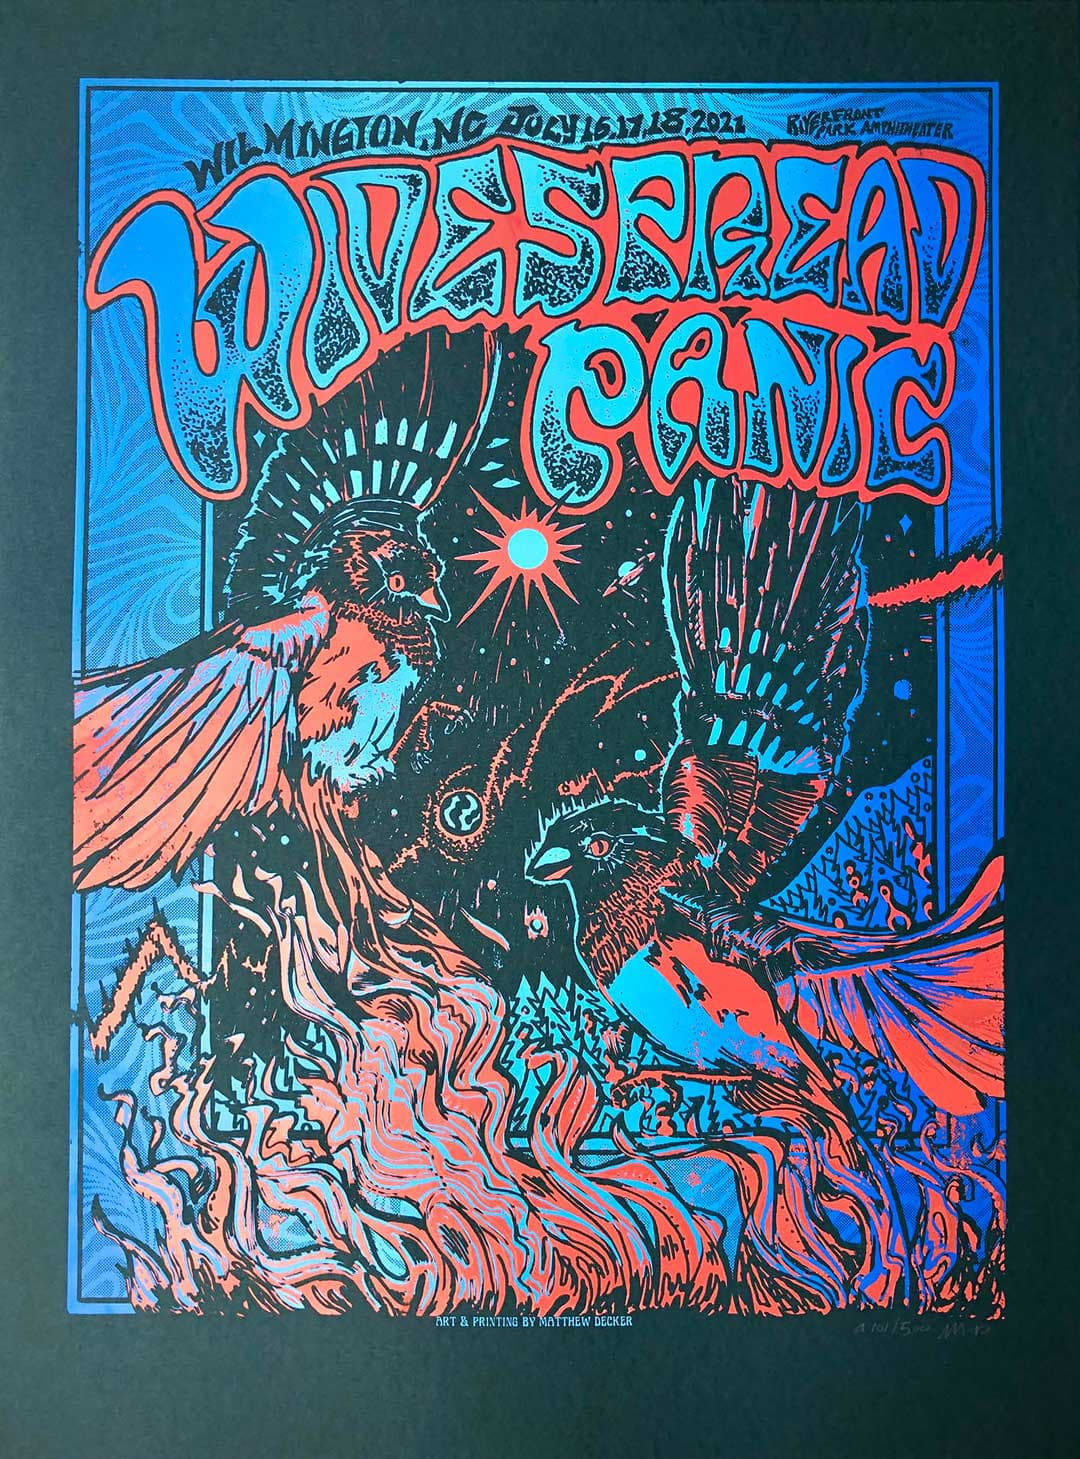 Widespread Panic Wilmington NC Event Poster by Matthew Decker